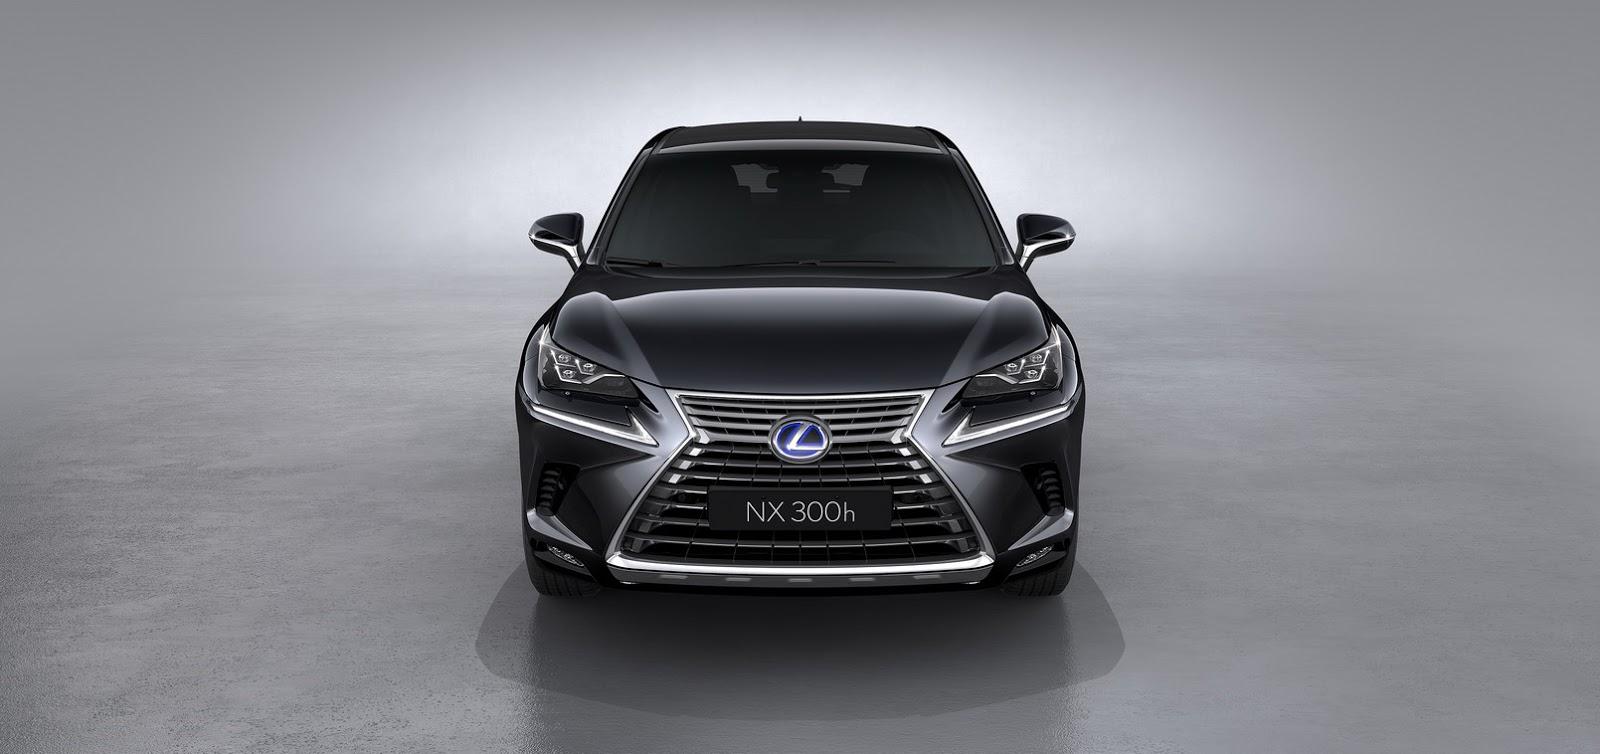 Lexus NX facelift 2018 (4)